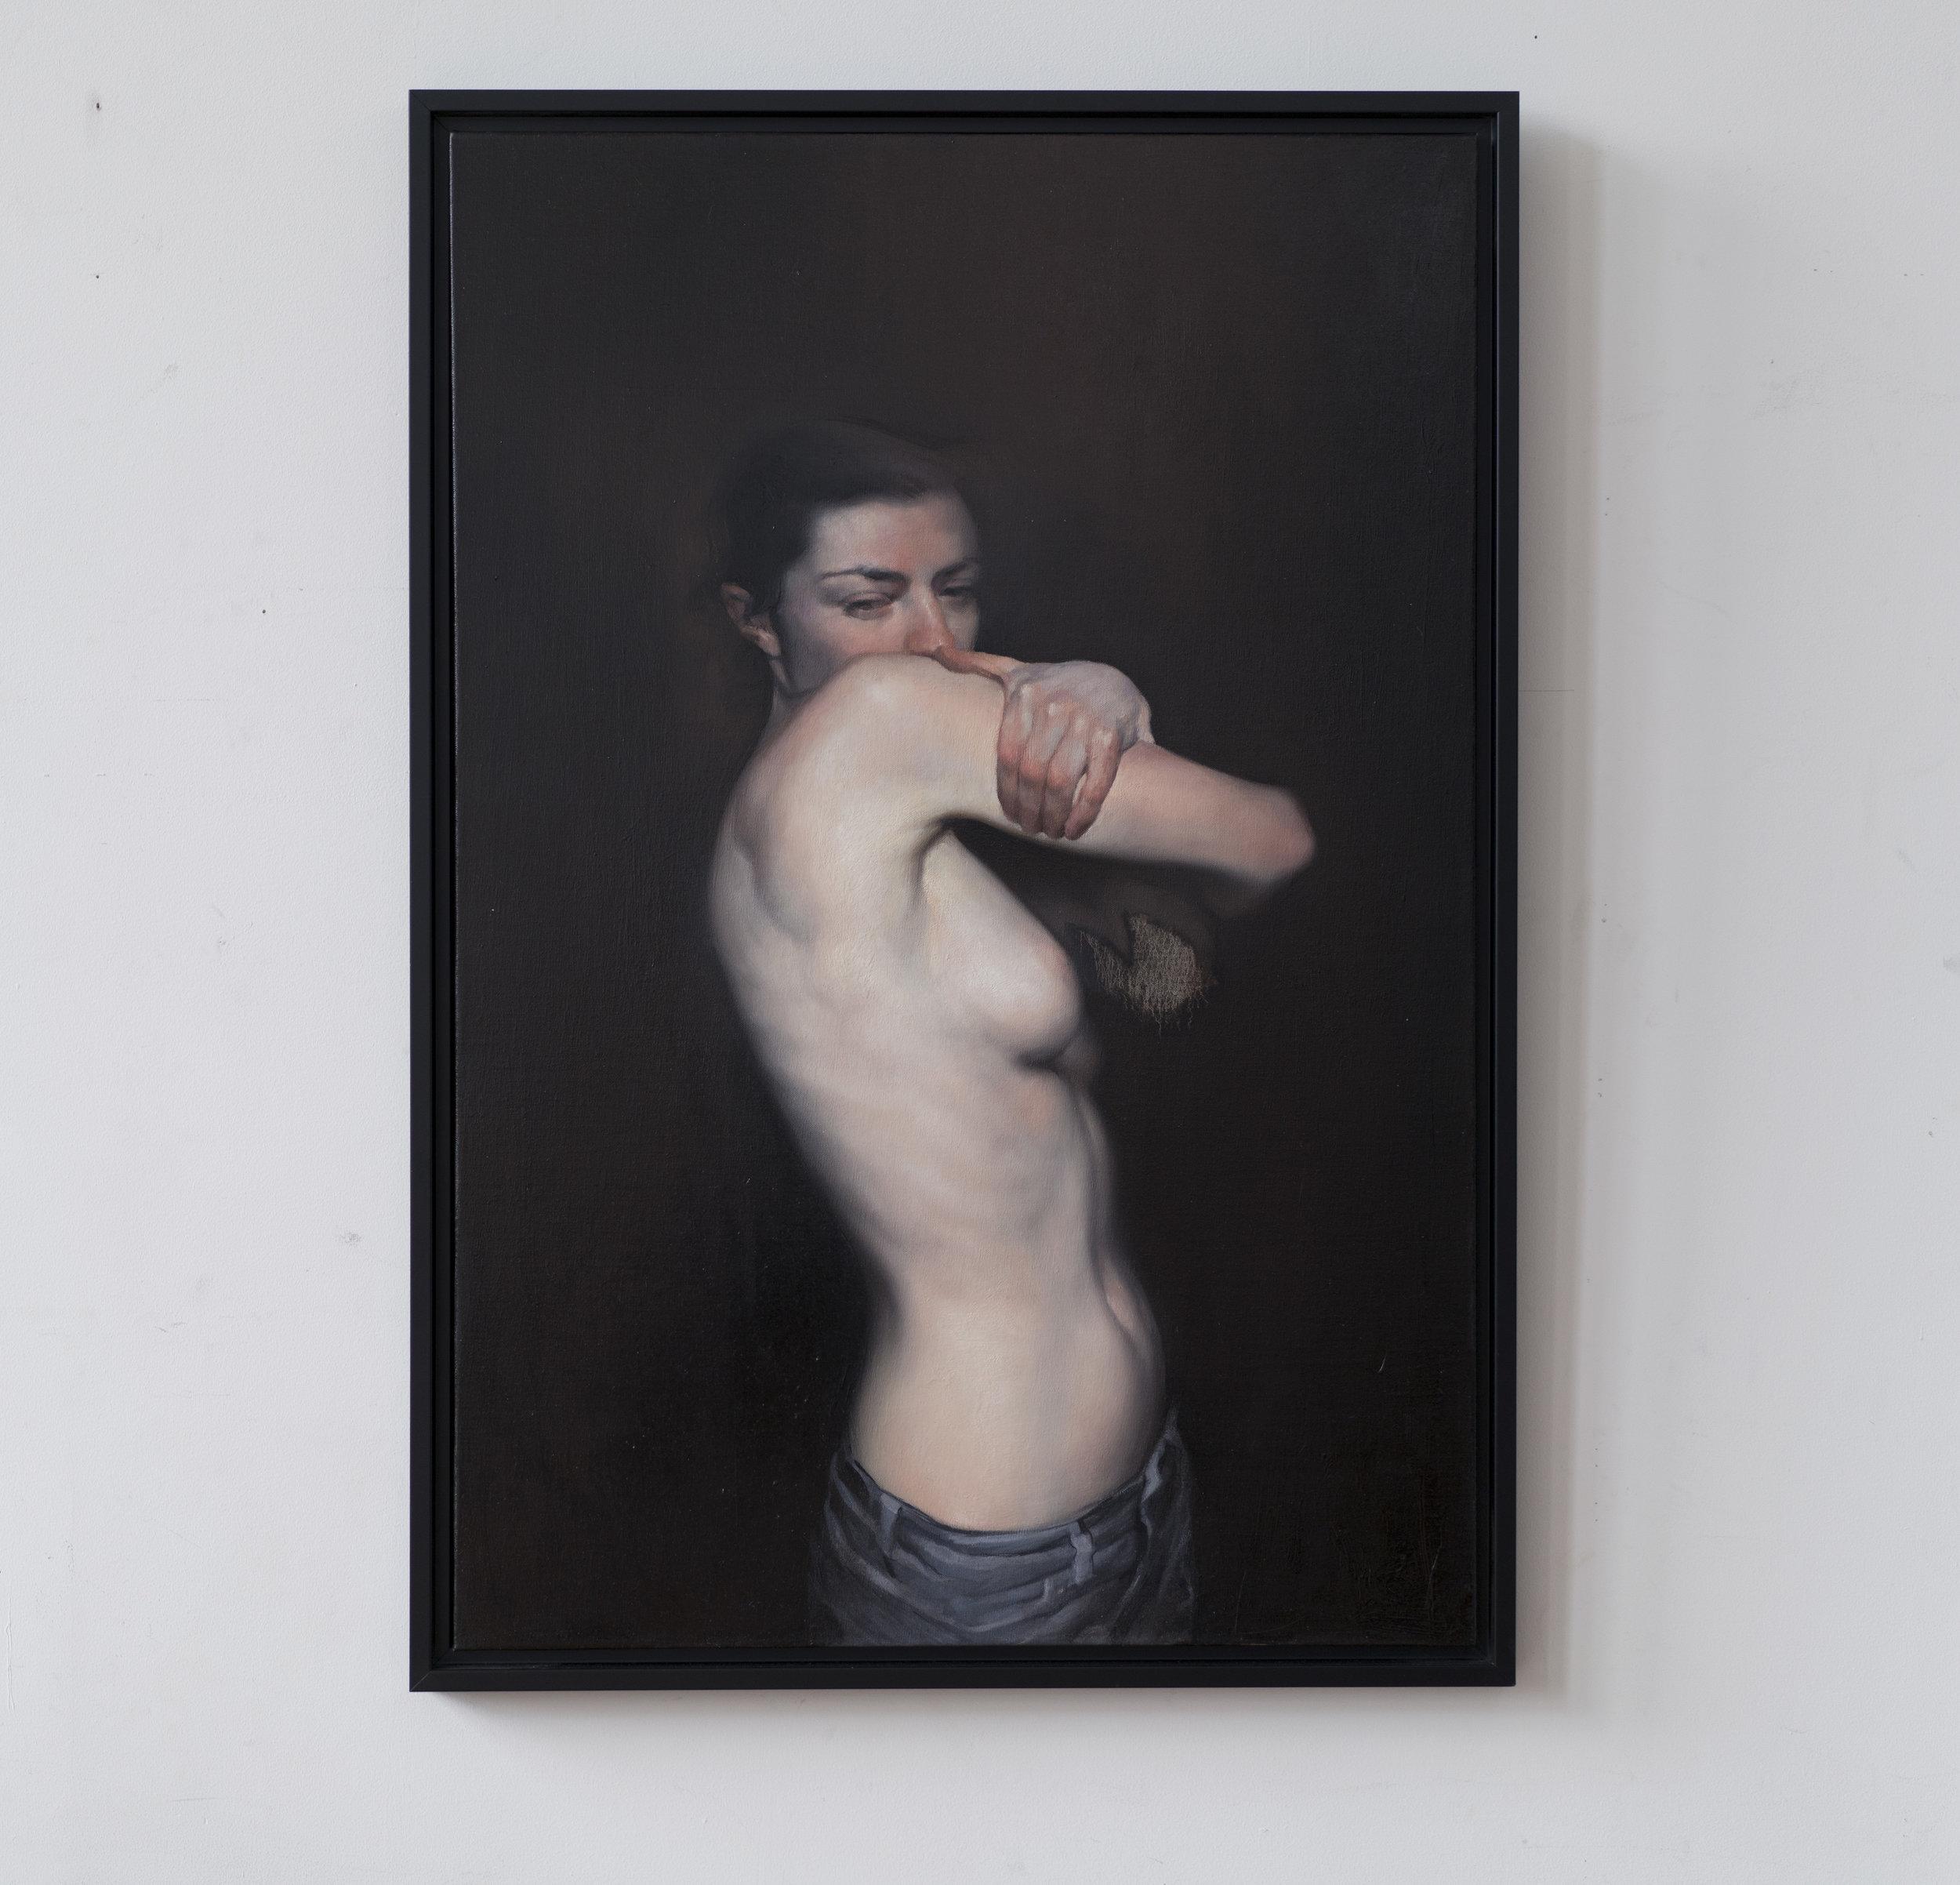 Maria kreyn _ obscure object framed on wall_28 x 40 inches.jpg